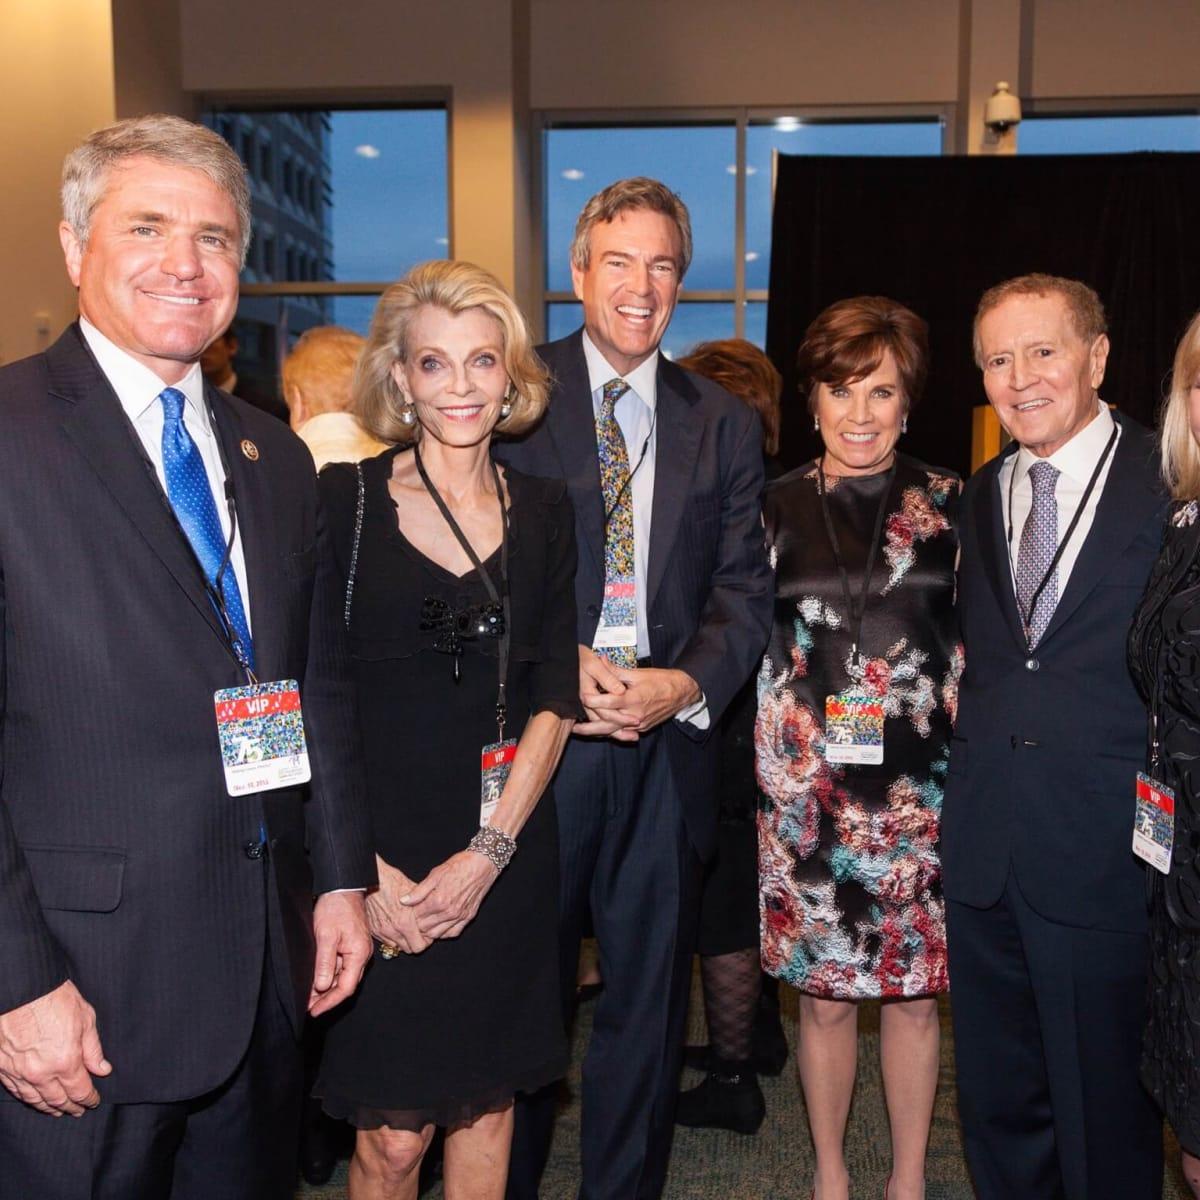 Mike McCaul, Alice Burguieres, Jim Hackett, Maureen Hackett, Mel Klein, Linda Mays McCaul at MD Anderson 75th anniversary gala